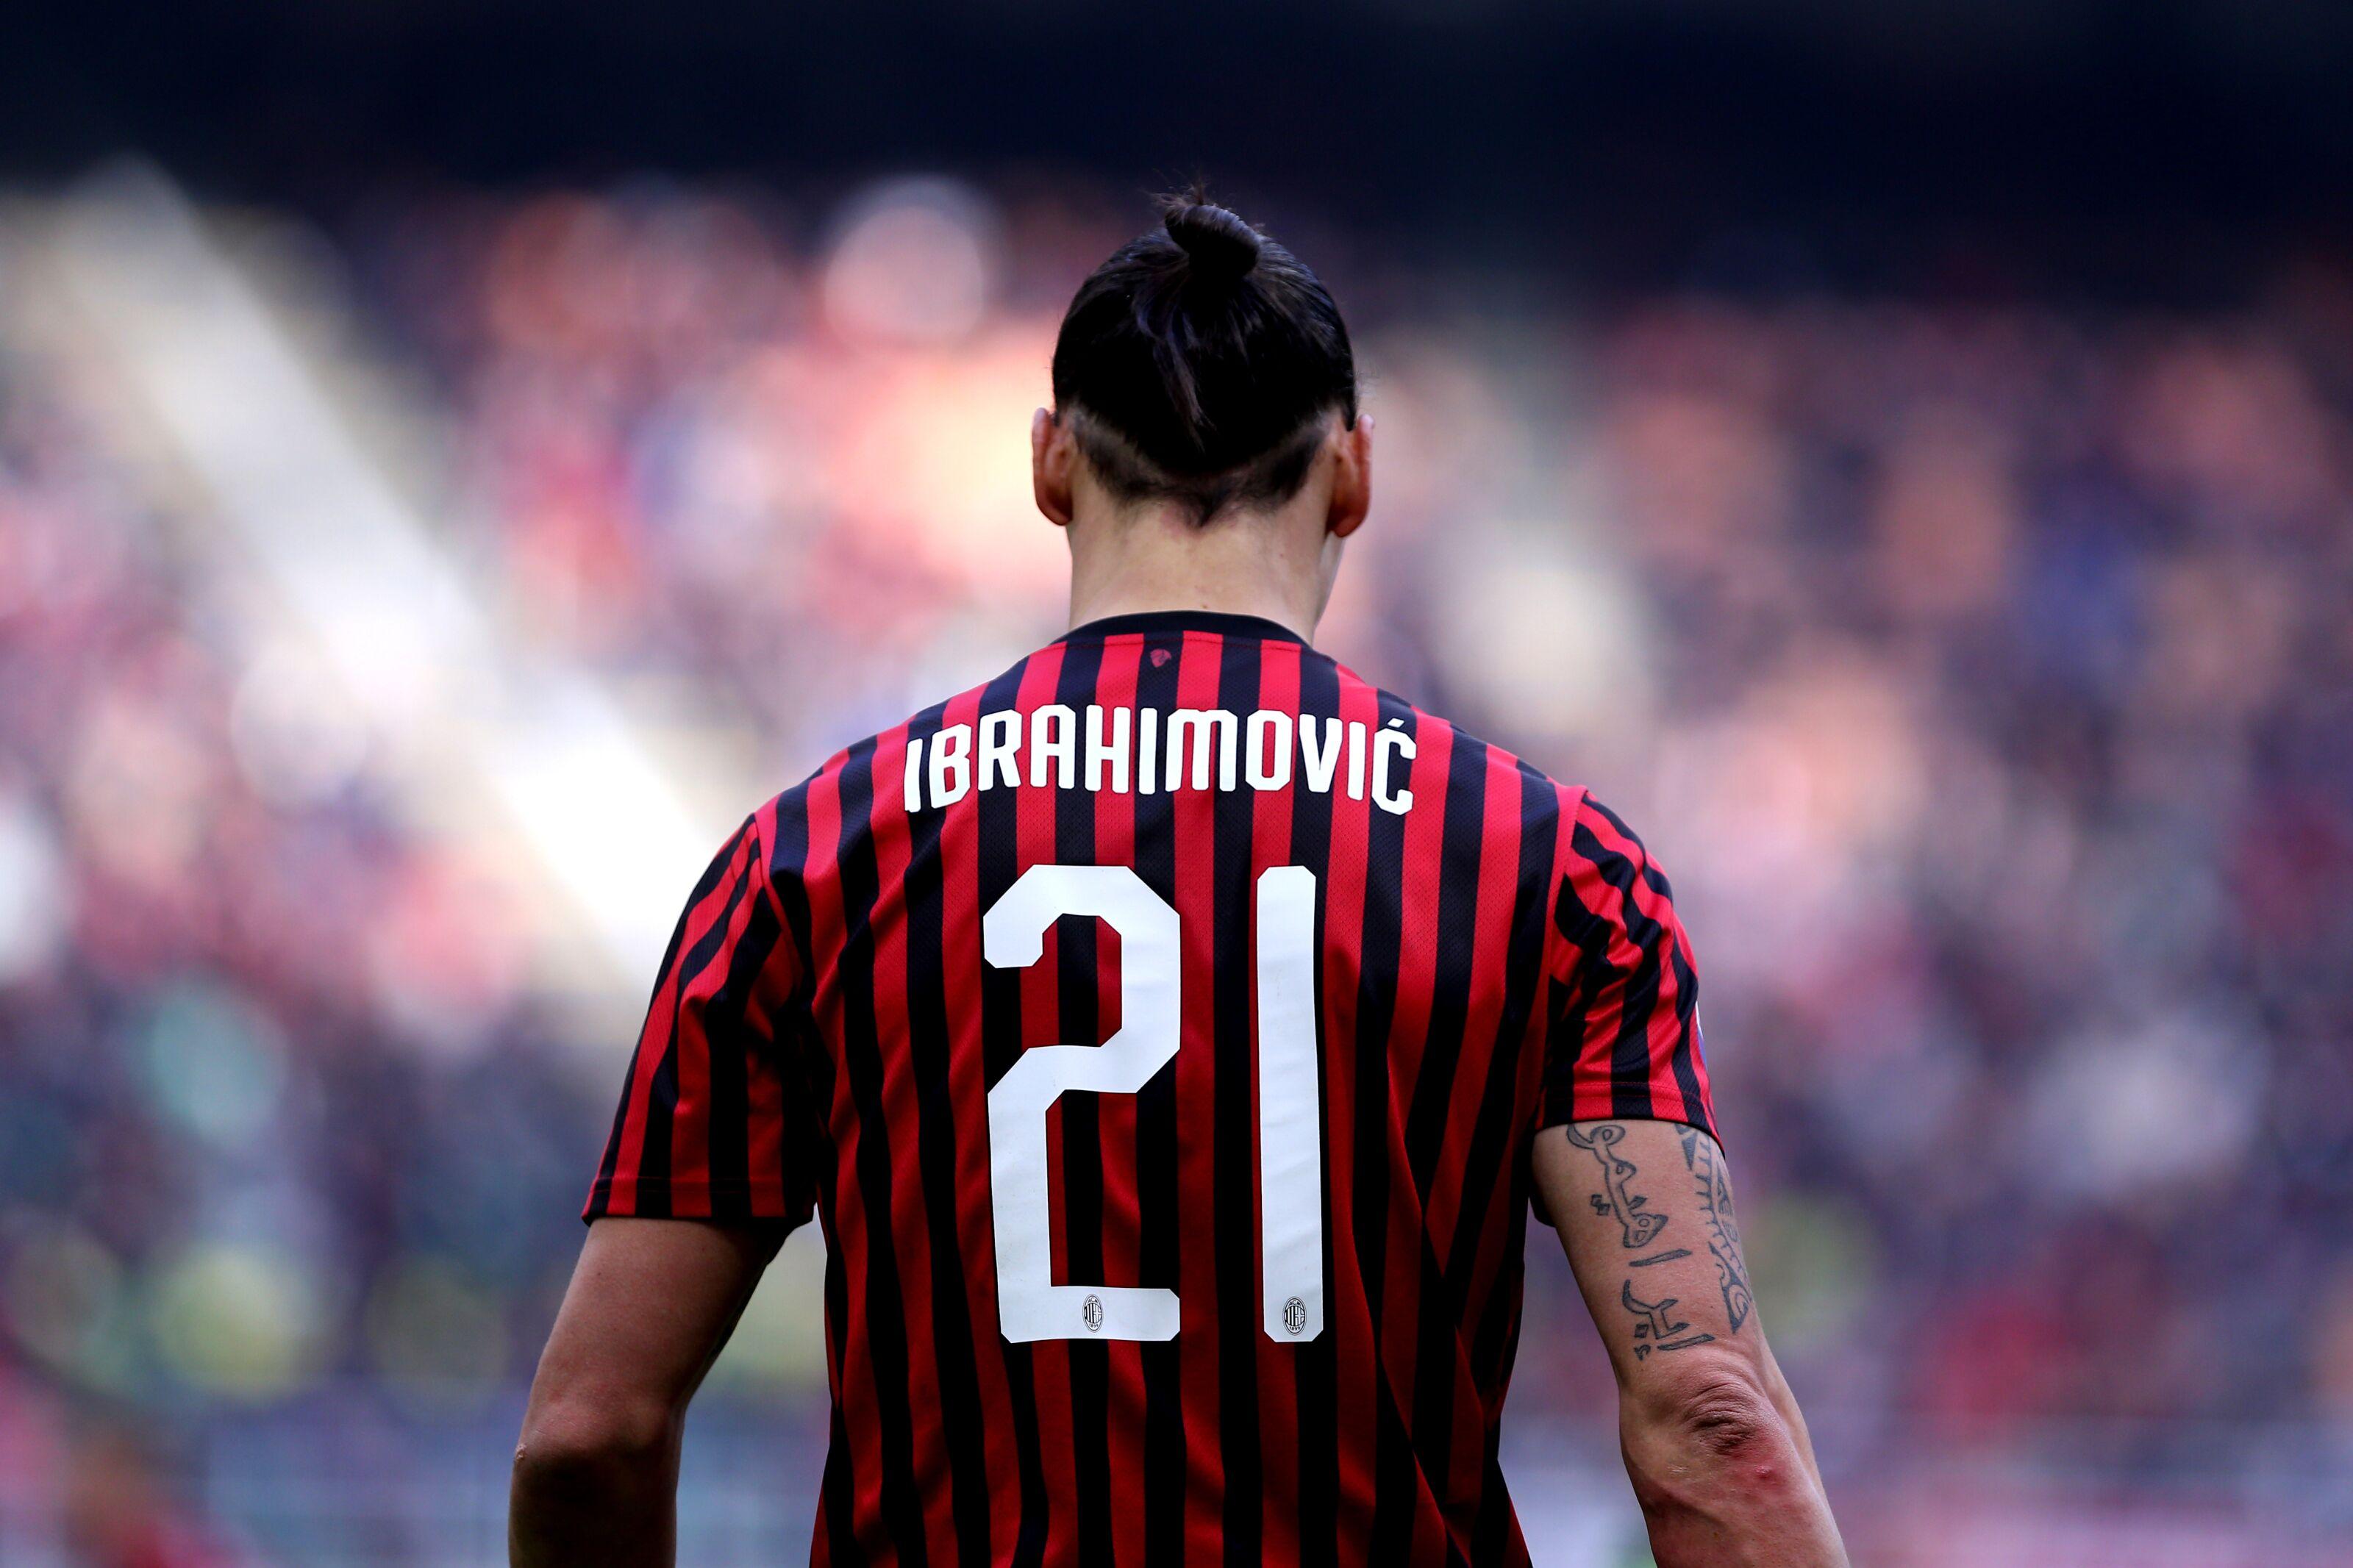 LA Galaxy: No one can replace Zlatan